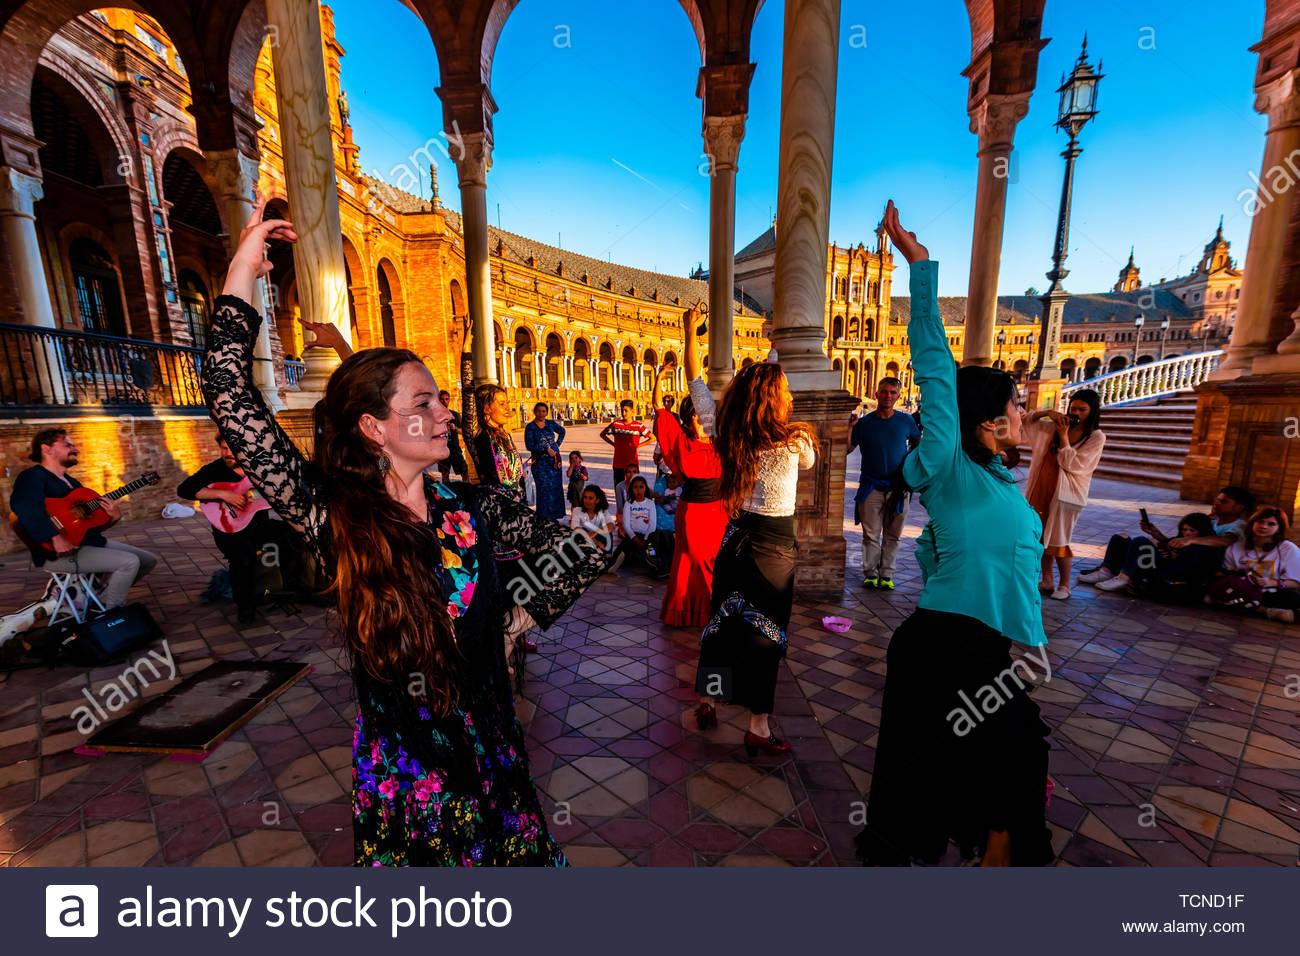 Flamenco dancing, Plaza de Espana, Parque Maria Luisa, Seville, Andalusia, Spain. - Stock Image